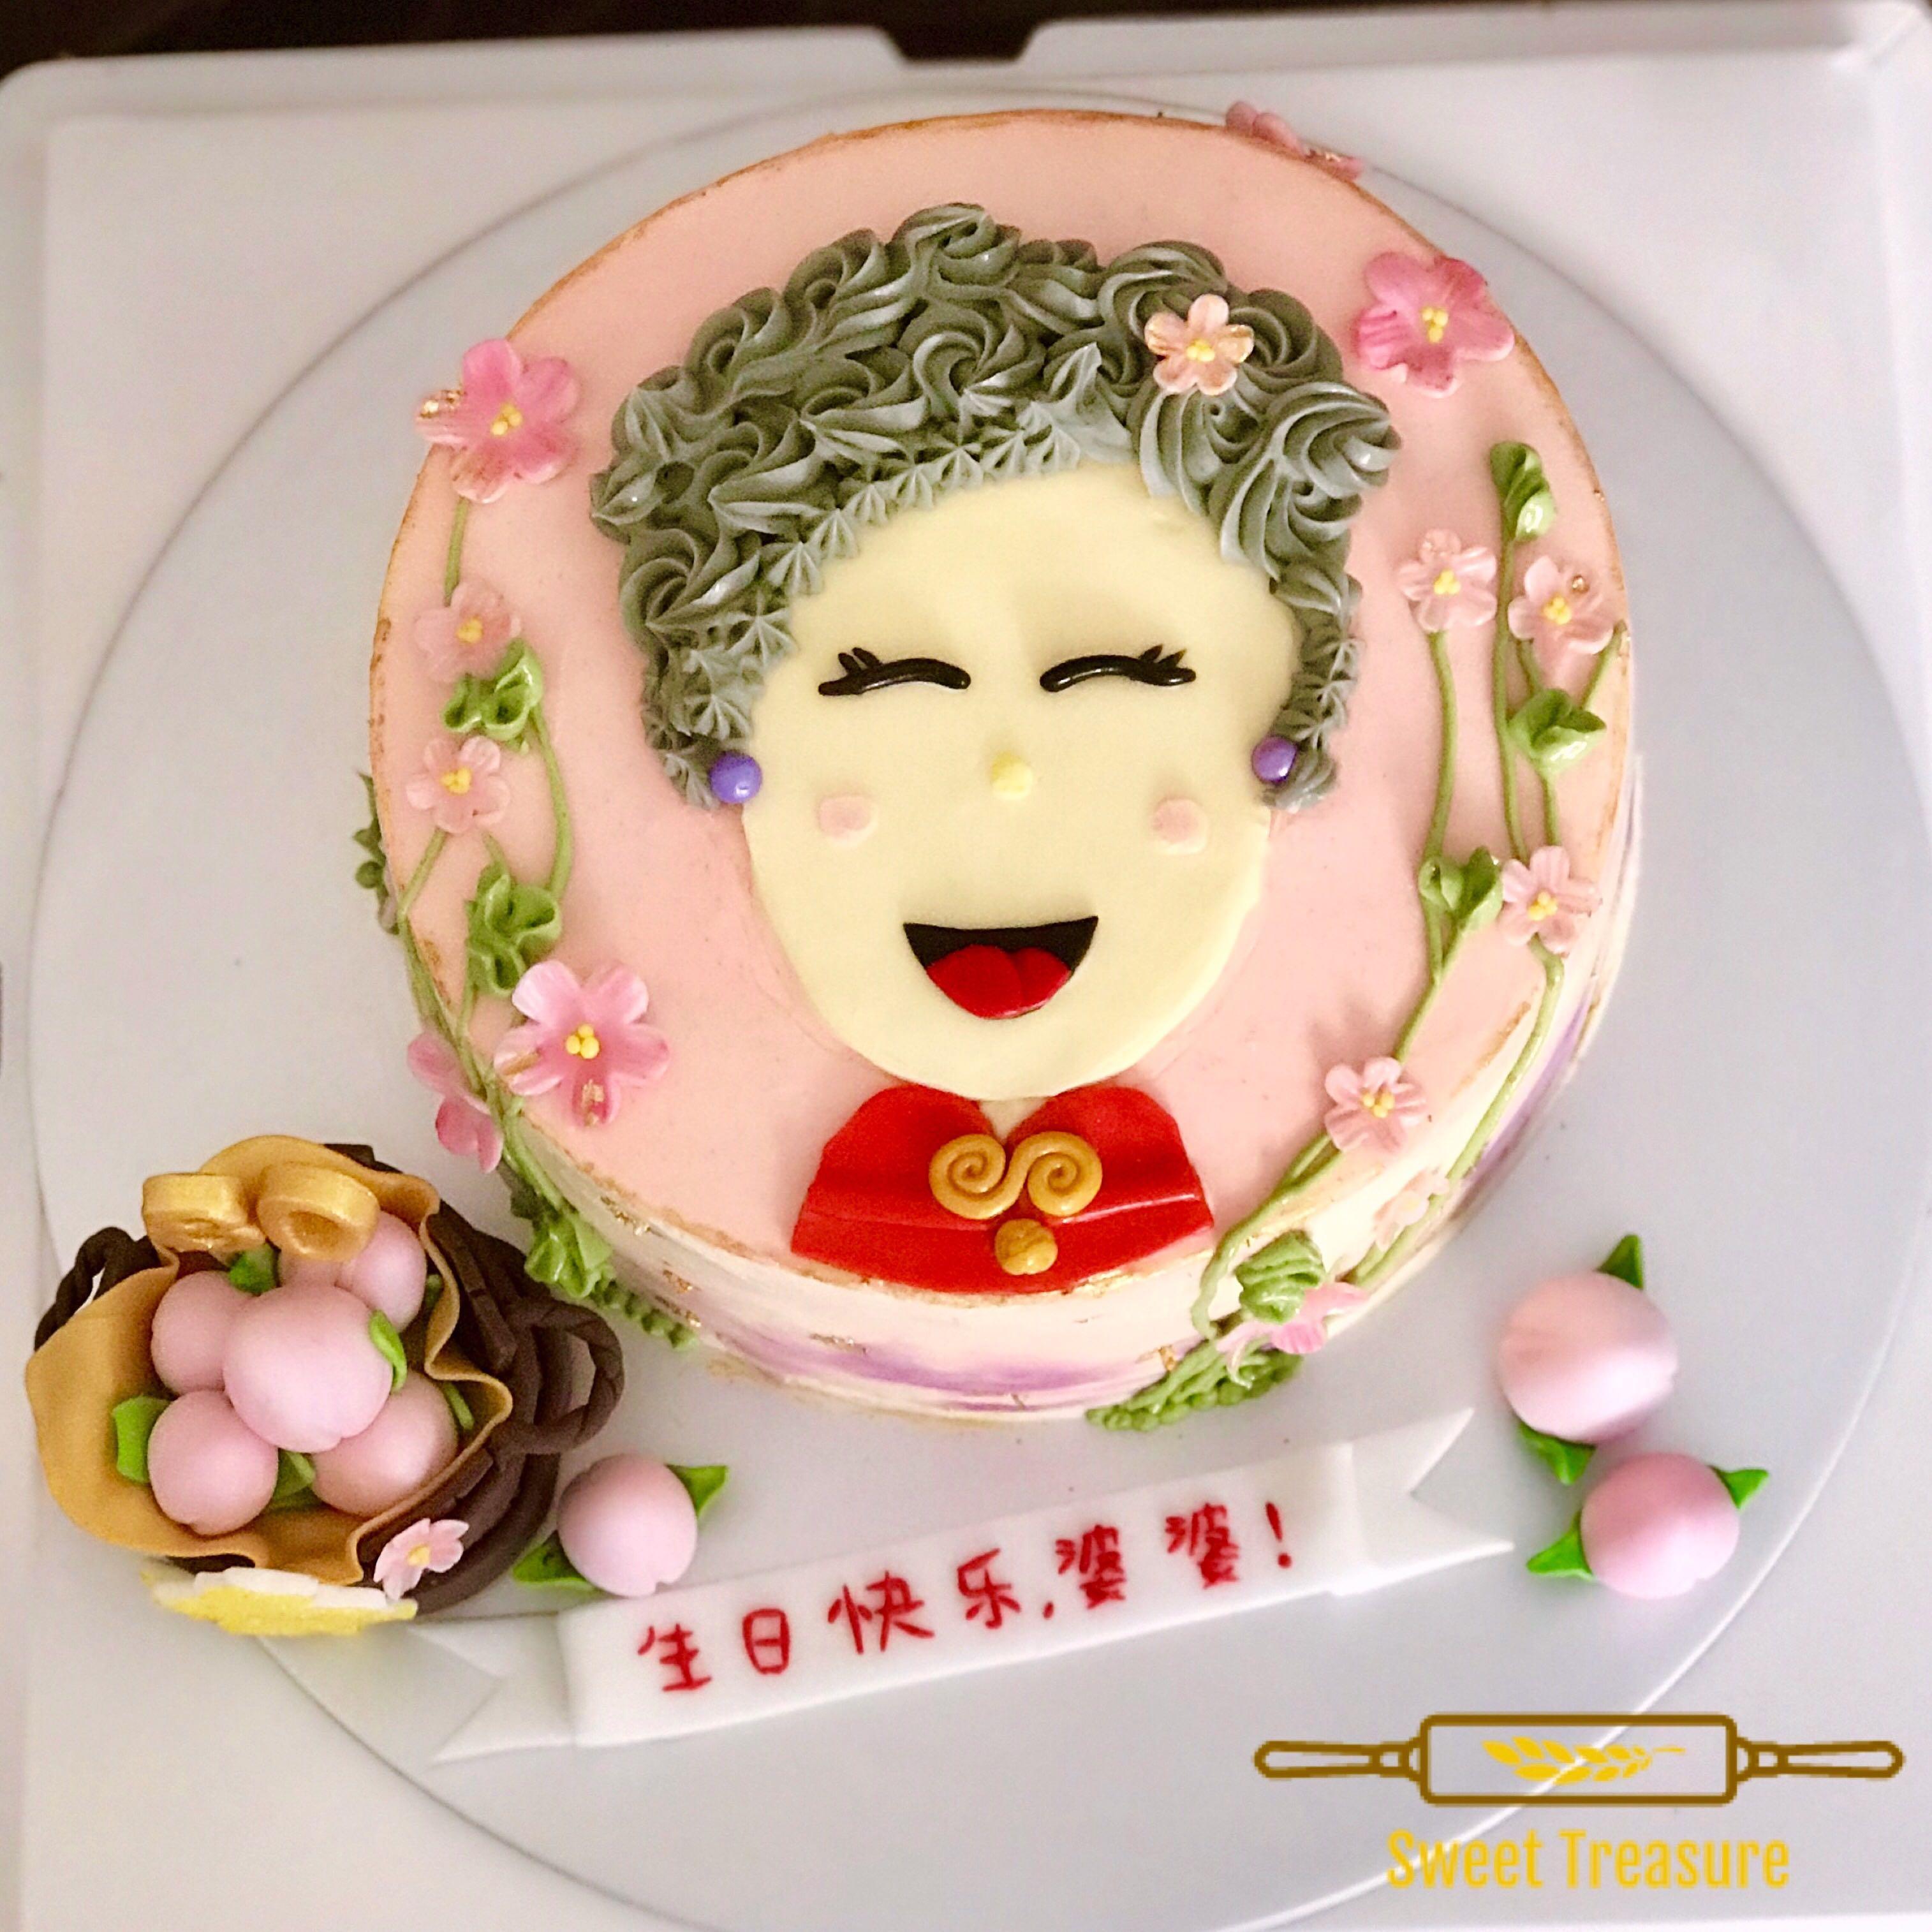 Sensational Customised Grandma Birthday Cake Food Drinks Baked Goods On Funny Birthday Cards Online Chimdamsfinfo